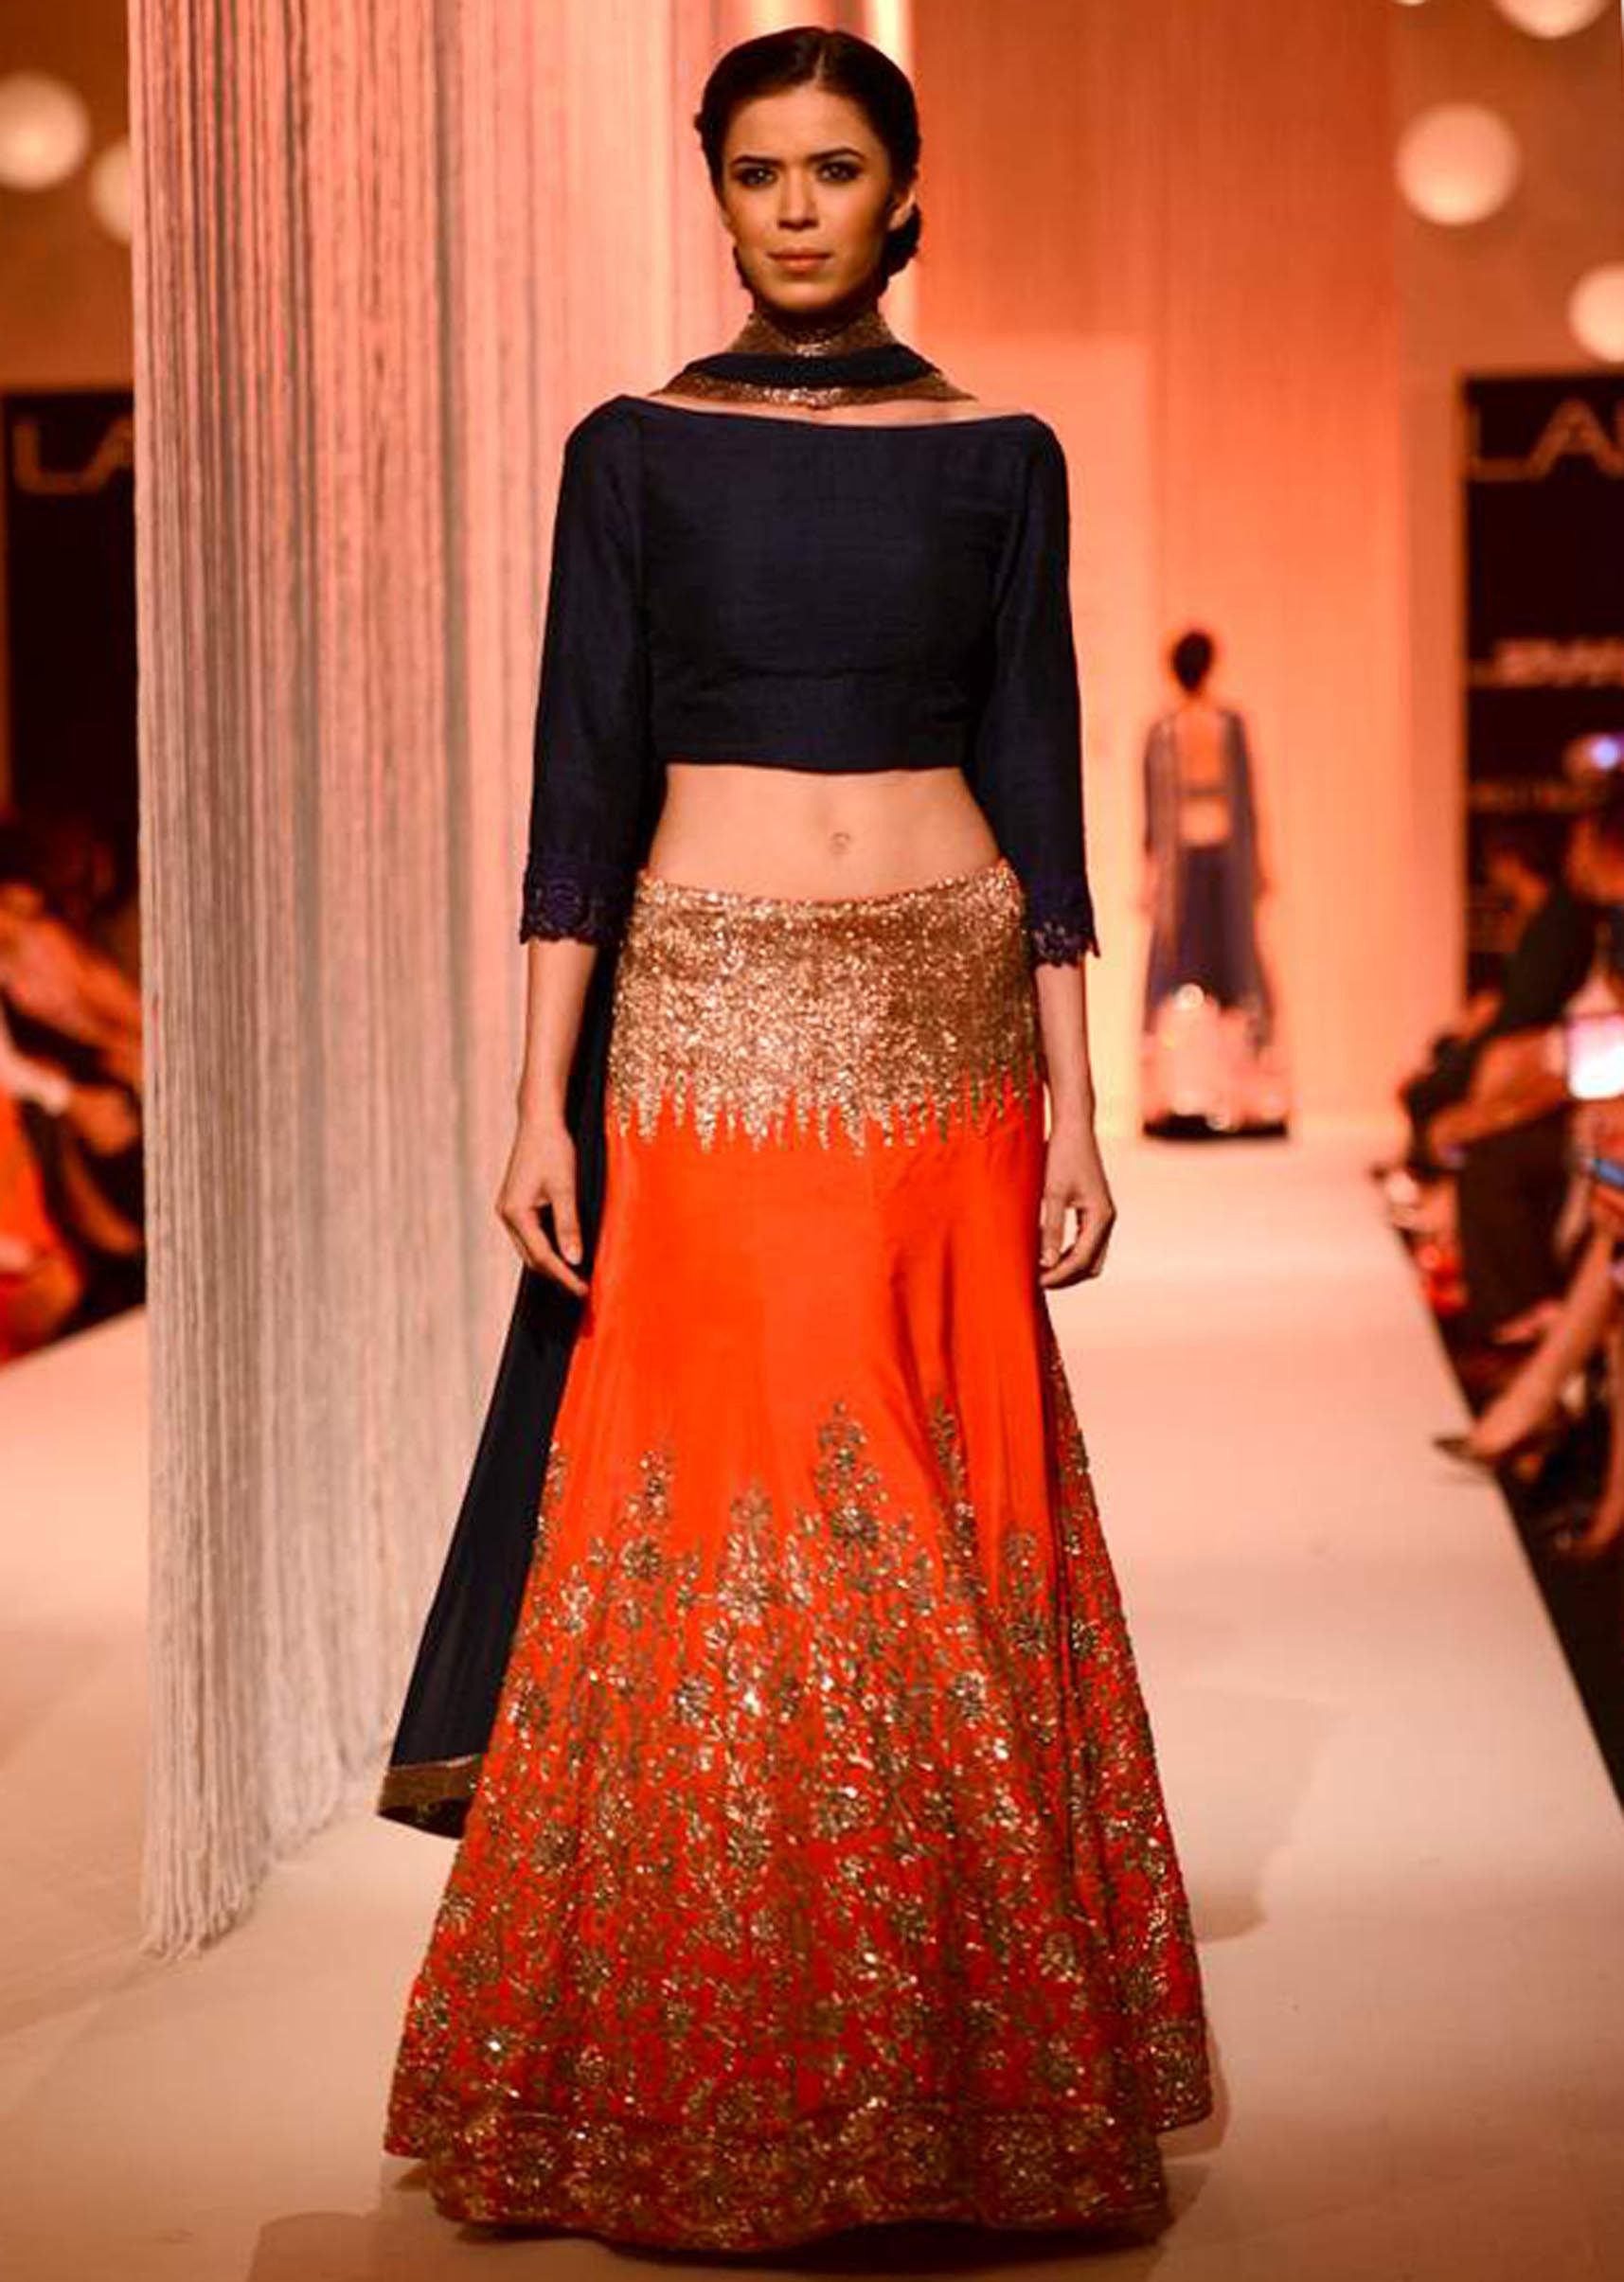 Manish Malhota collecton named Reflection at the lakme Fashion week Winter/Festival 2013 MM 132 - Kalkifashion.com